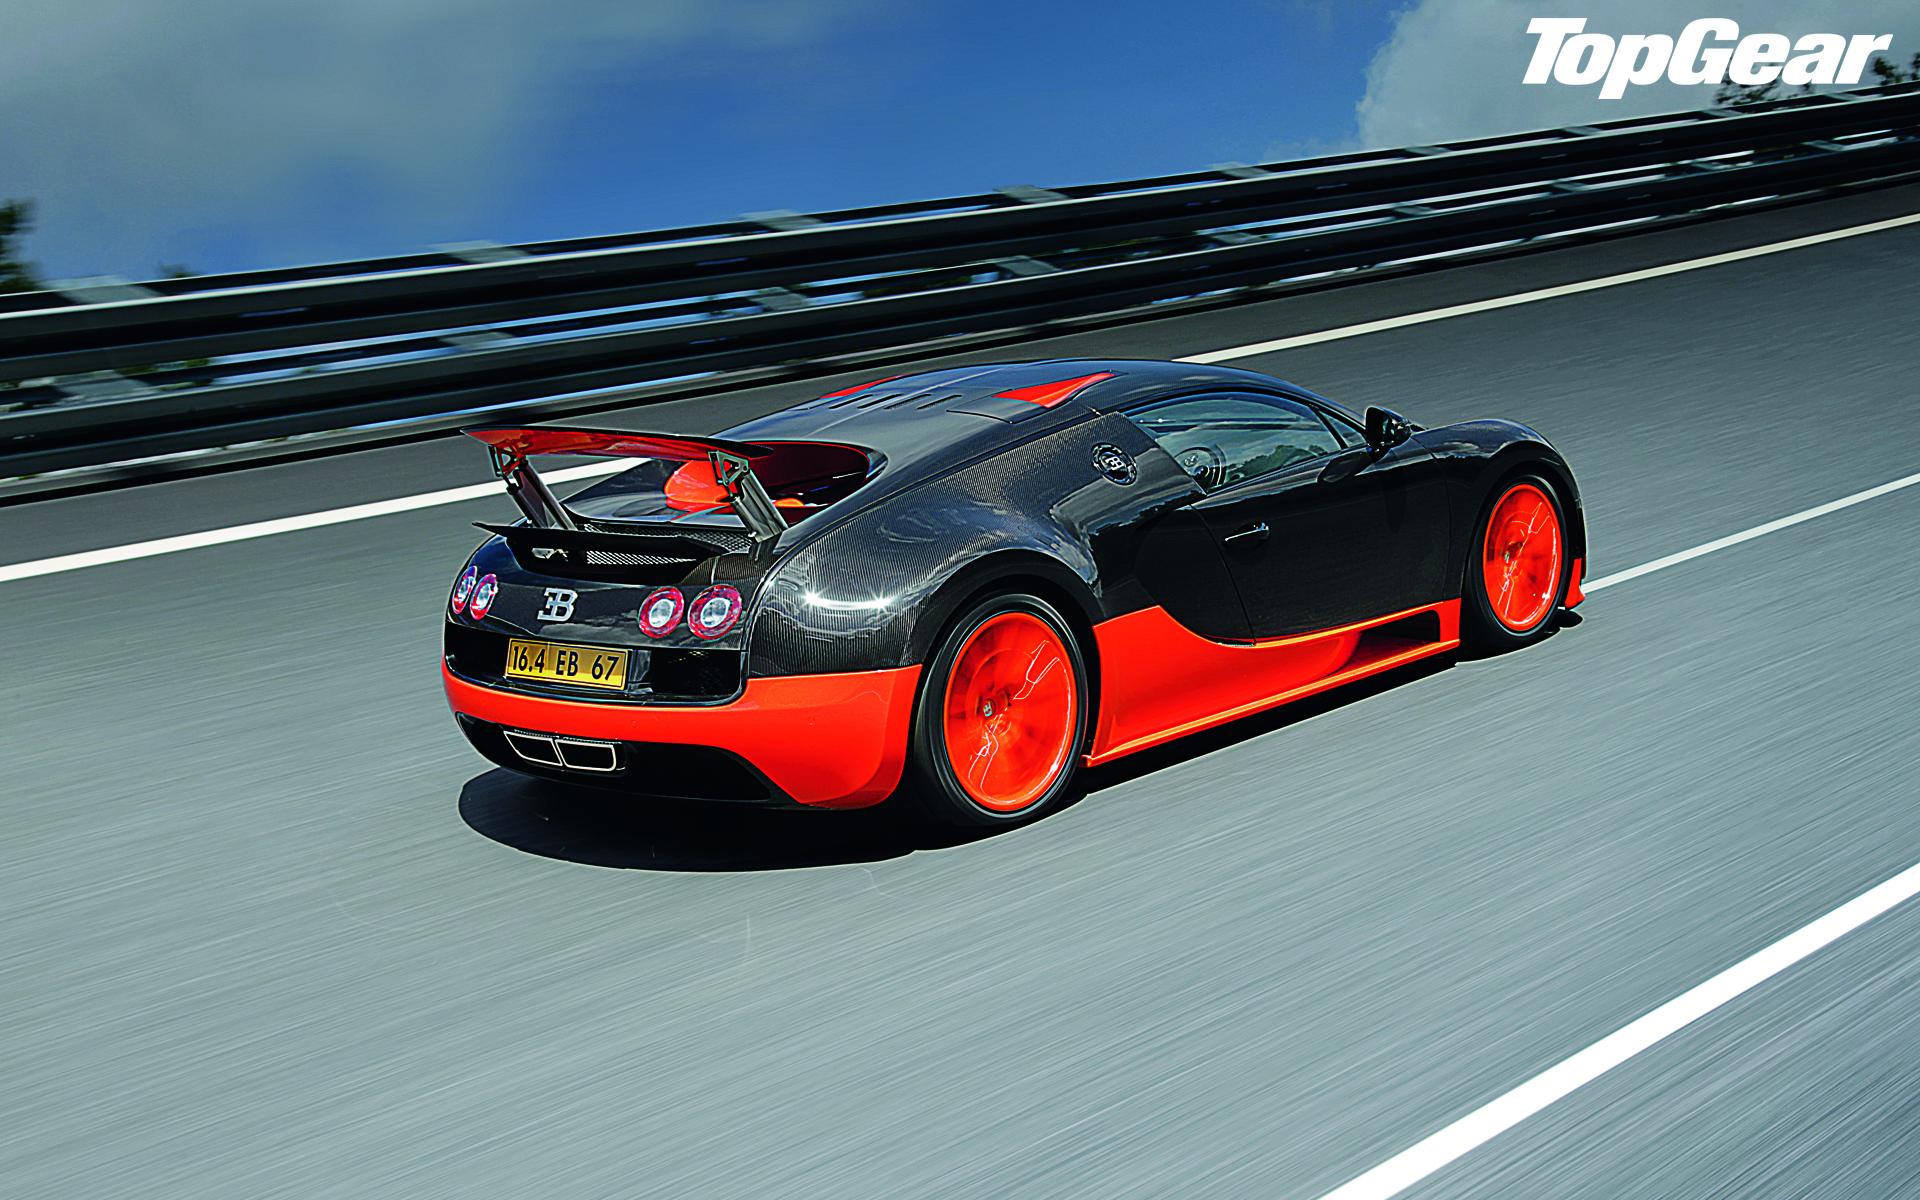 bugatti veyron super sport gold wallpaper 249 engine information - Bugatti Veyron Super Sport Top Gear Wallpaper